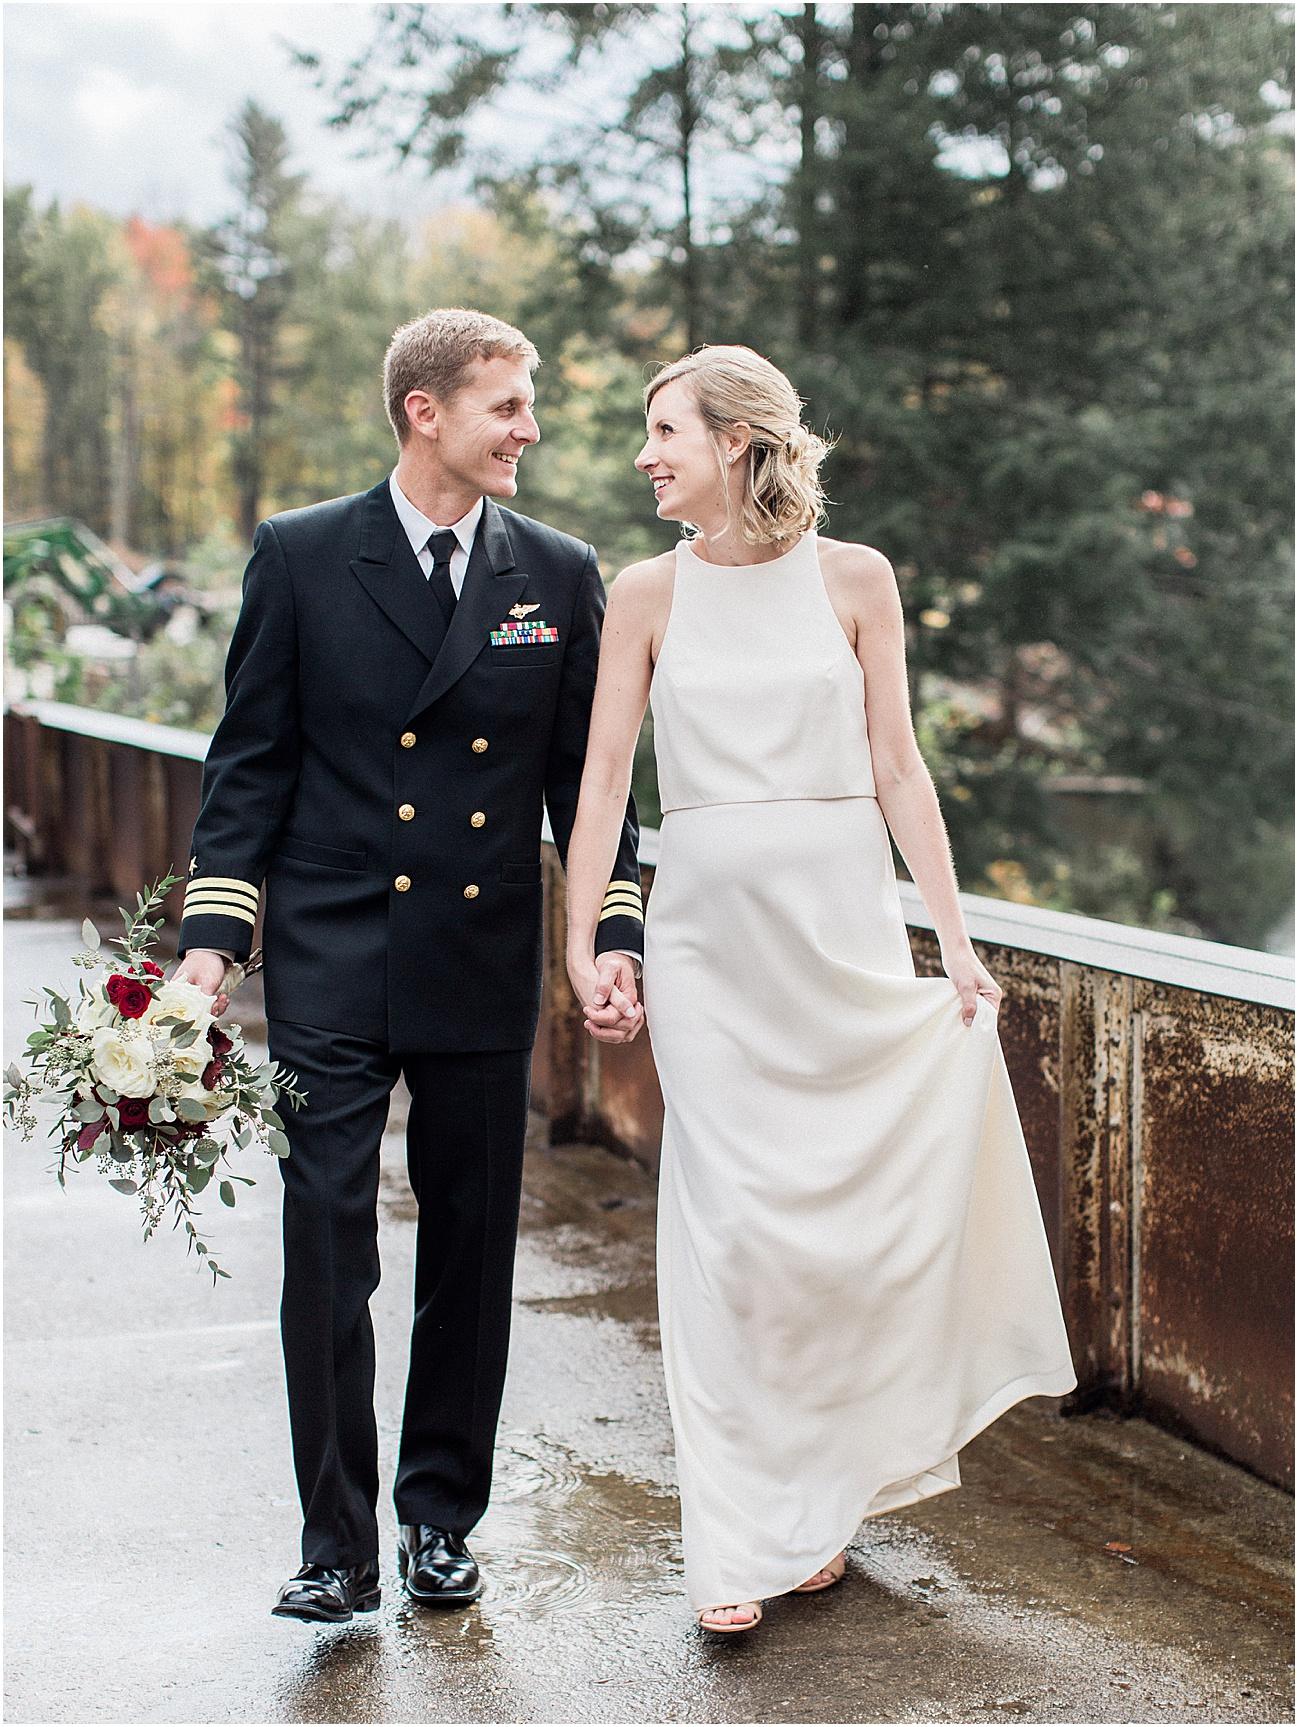 lauren_john_jon_ablany_browns_brewery_moses_farm_fall_cape_cod_boston_wedding_photographer_meredith_jane_photography_photo_1512.jpg